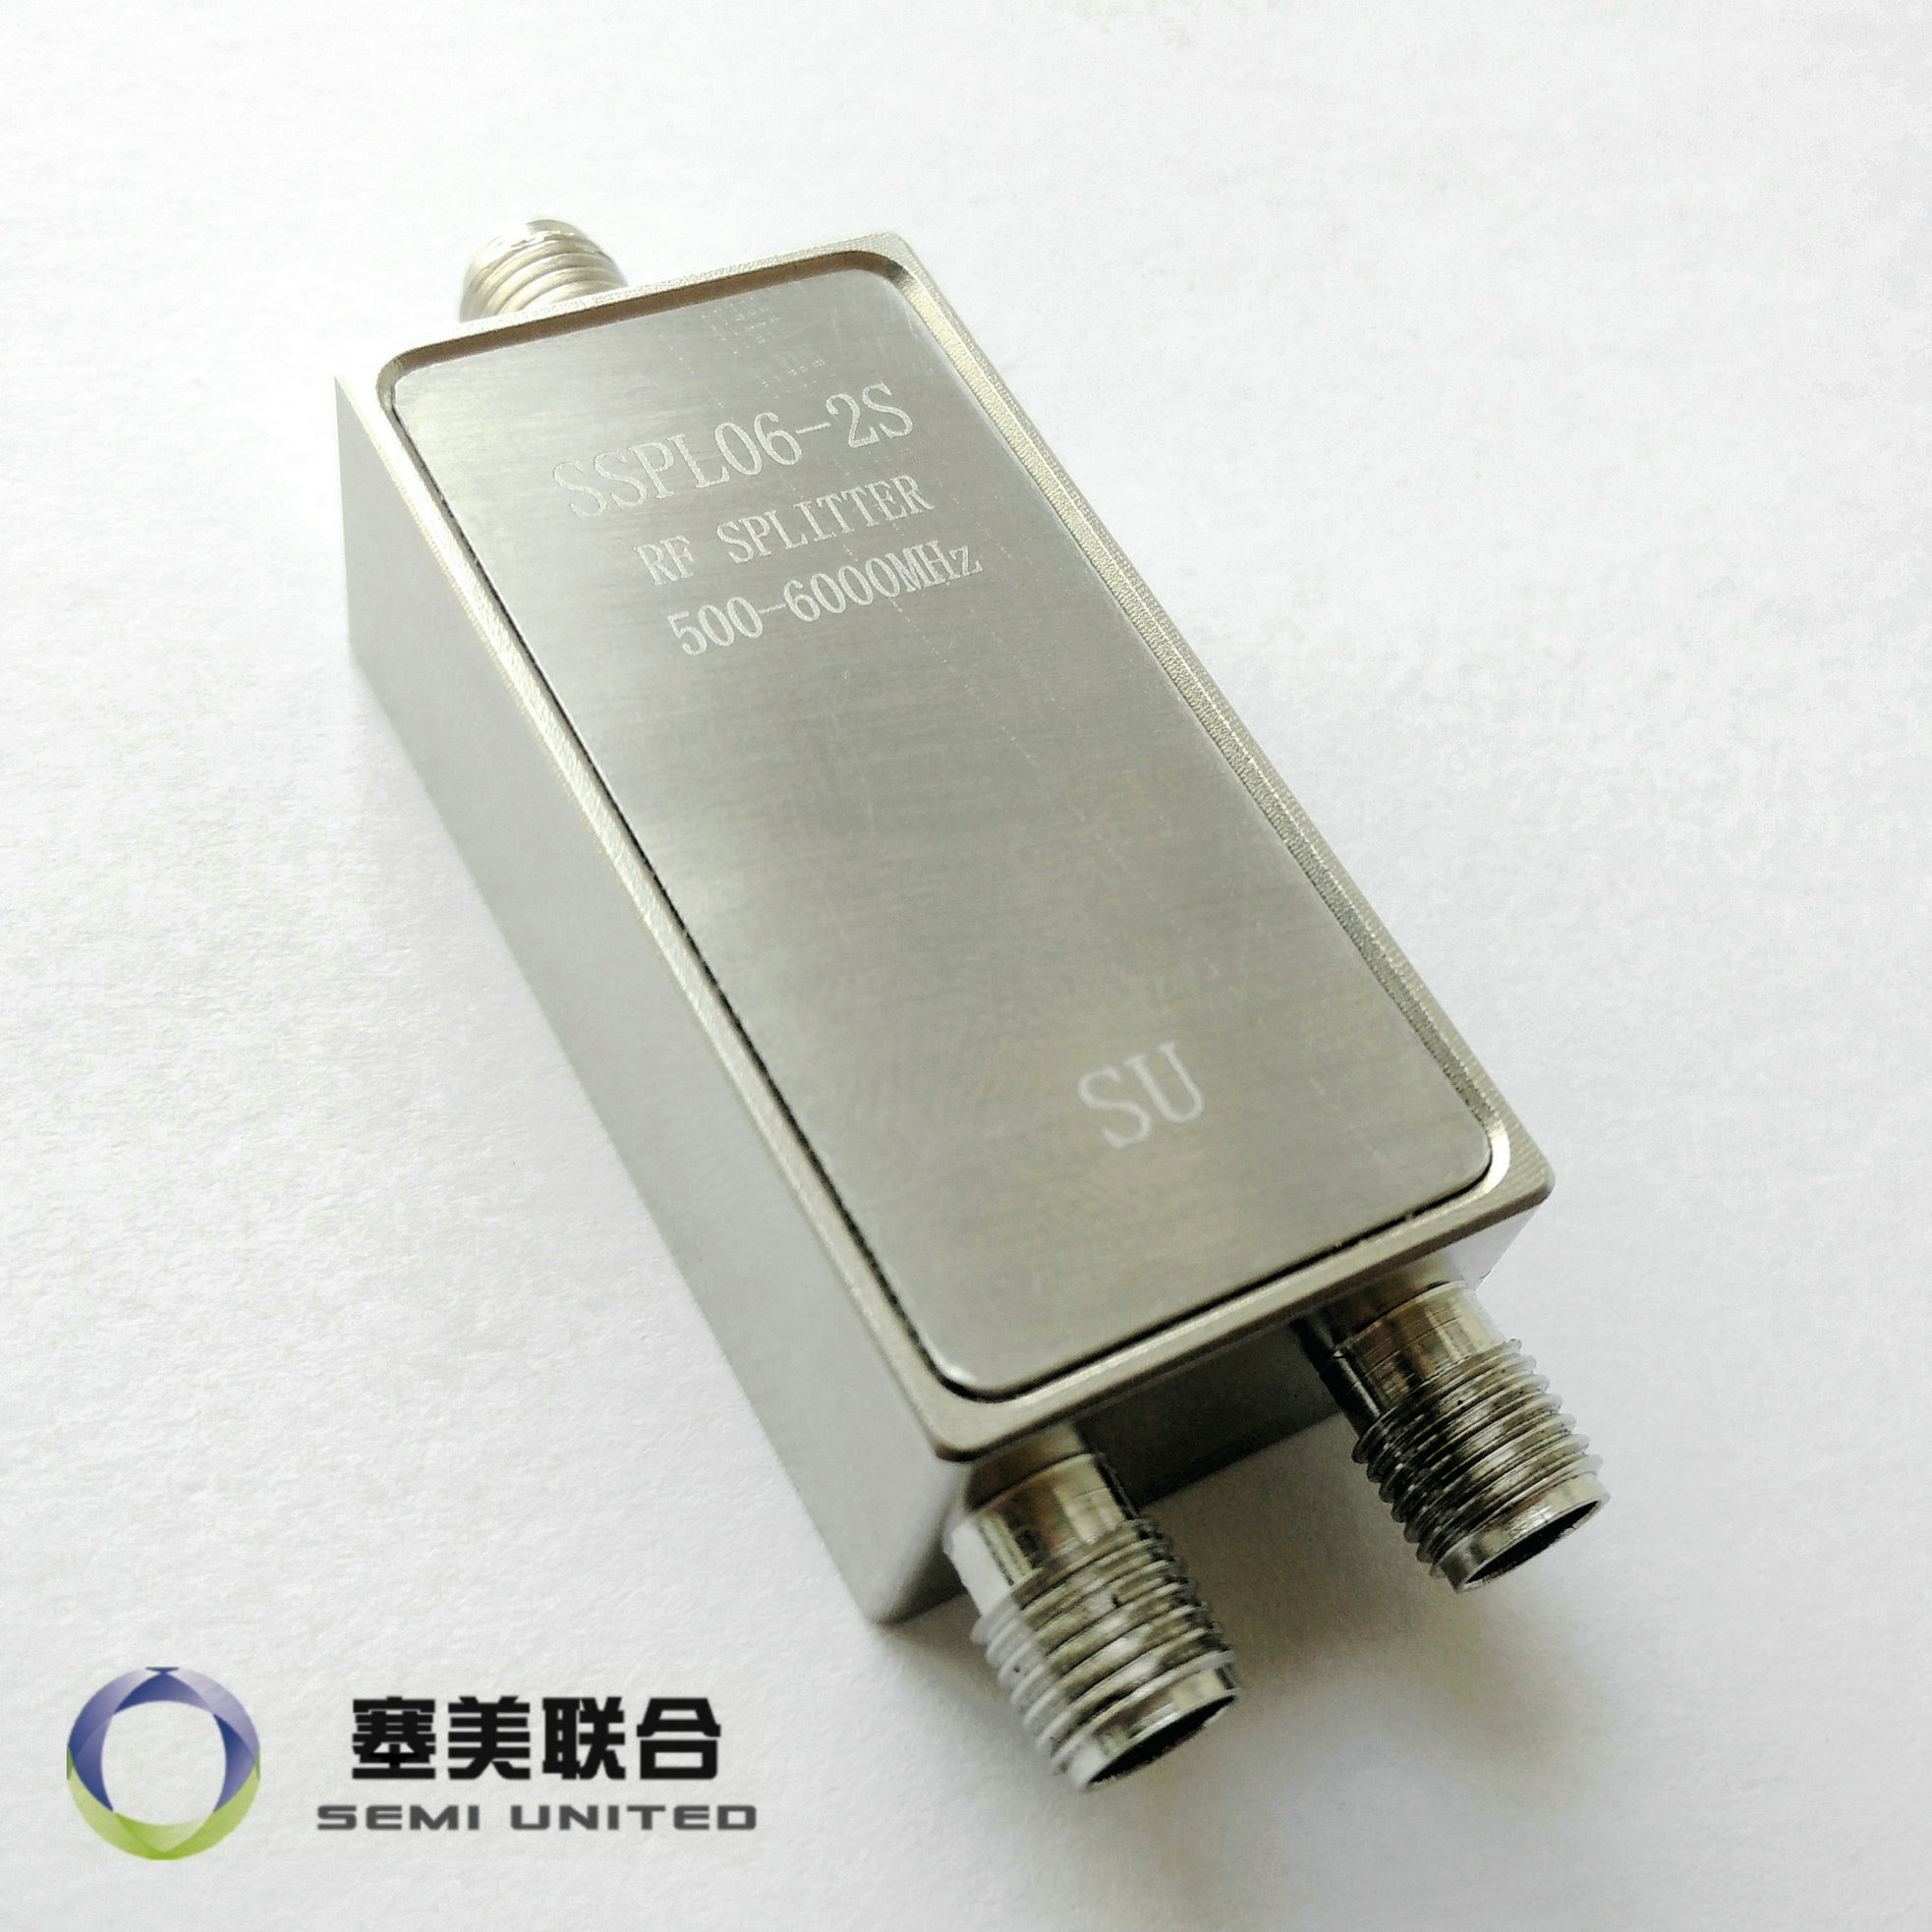 SSPL06-2S 0.5-6G8G GSM نظام تحديد المواقع واي فاي SMA اثنين مُقسم القدرة الكهربية ل 0120A02056002D